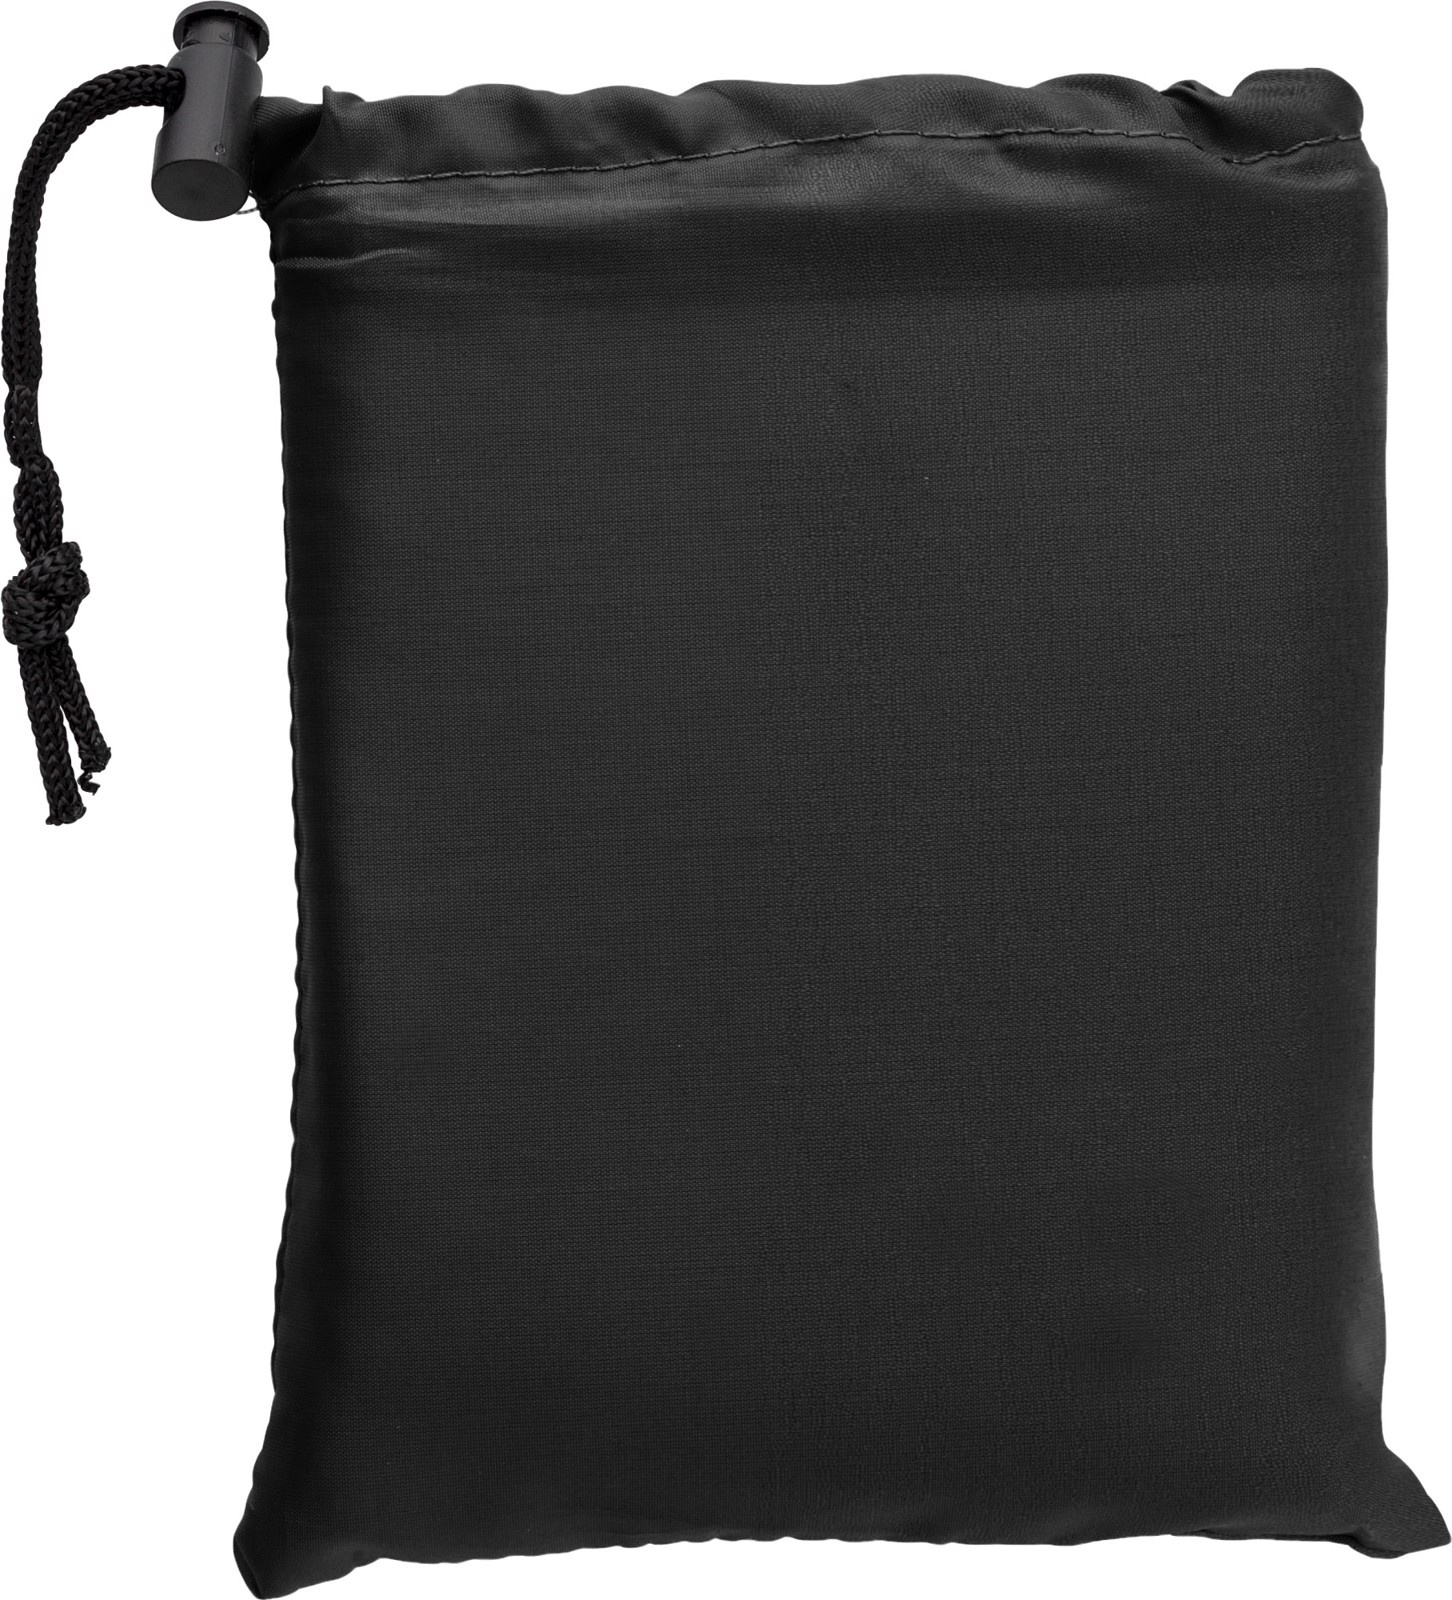 Polyester (600D) stadium cushion - Black